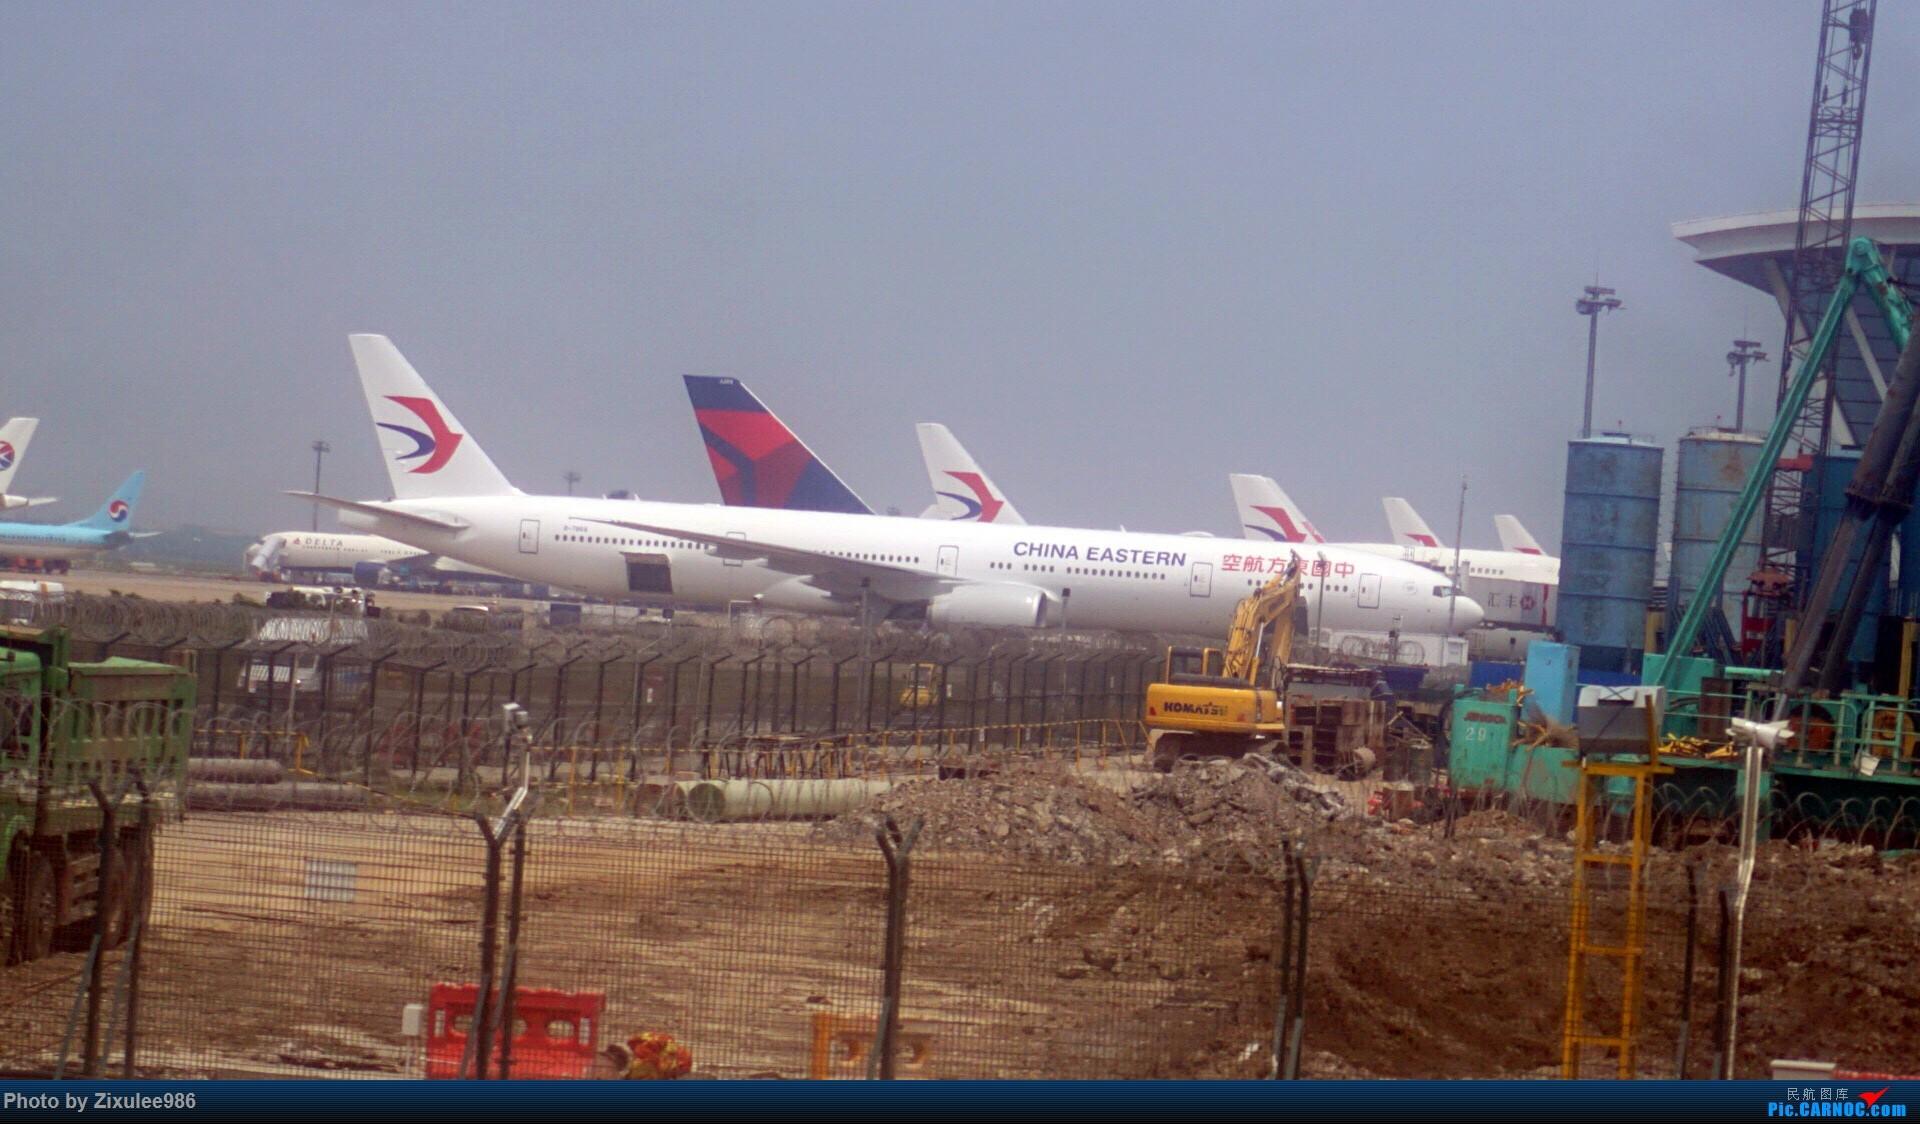 Re:[原创]加拿大21日游学之旅(一)~JJN-PVG-YYZ..(内含flightlog)~第一次发游记~多图缓更请谅解 BOEING 777-39P(ER) B-7868 中国上海浦东国际机场